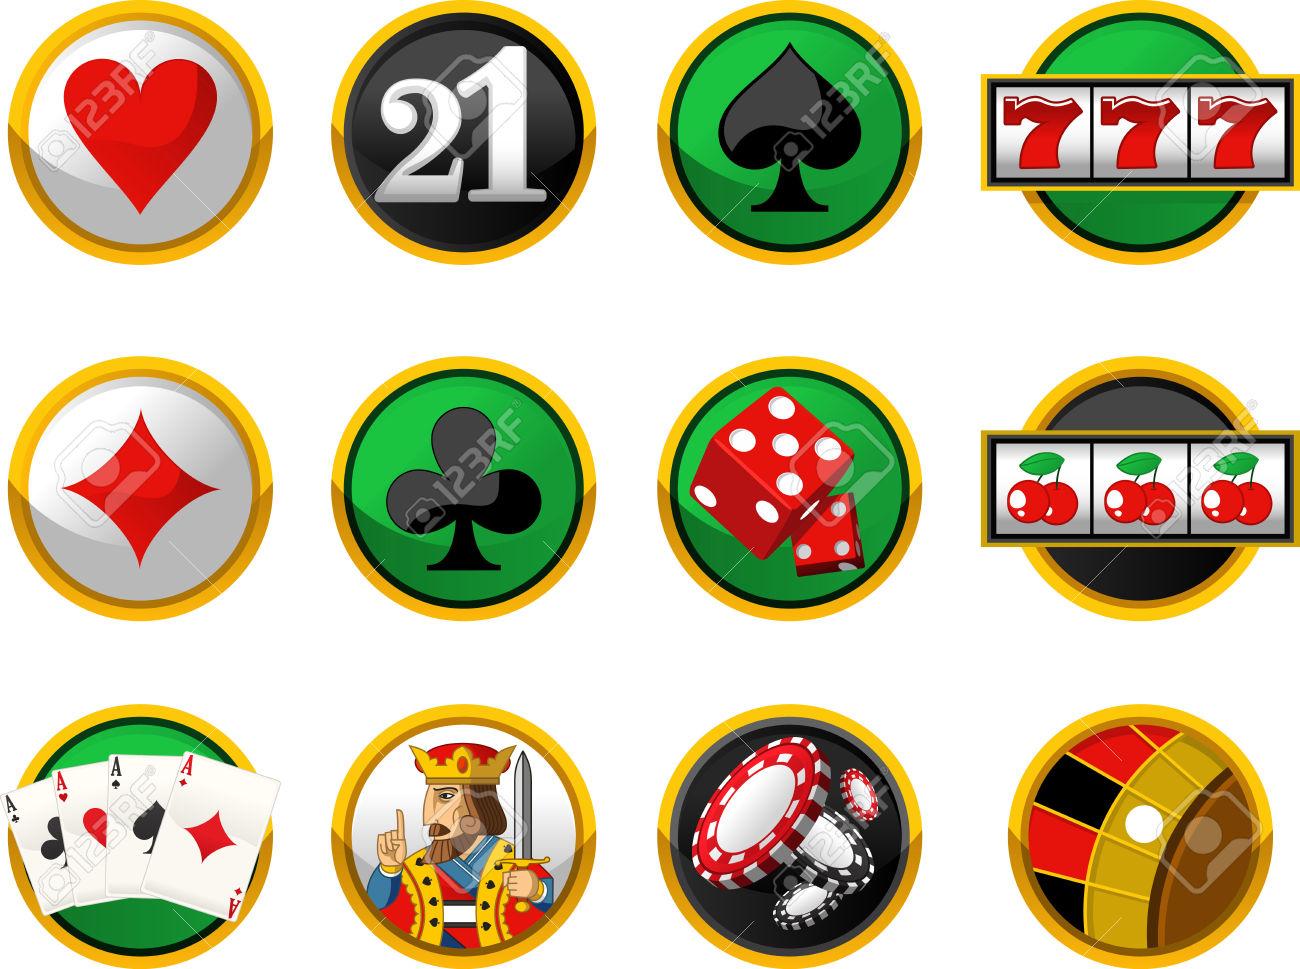 imagescarte-de-casino-34.jpg